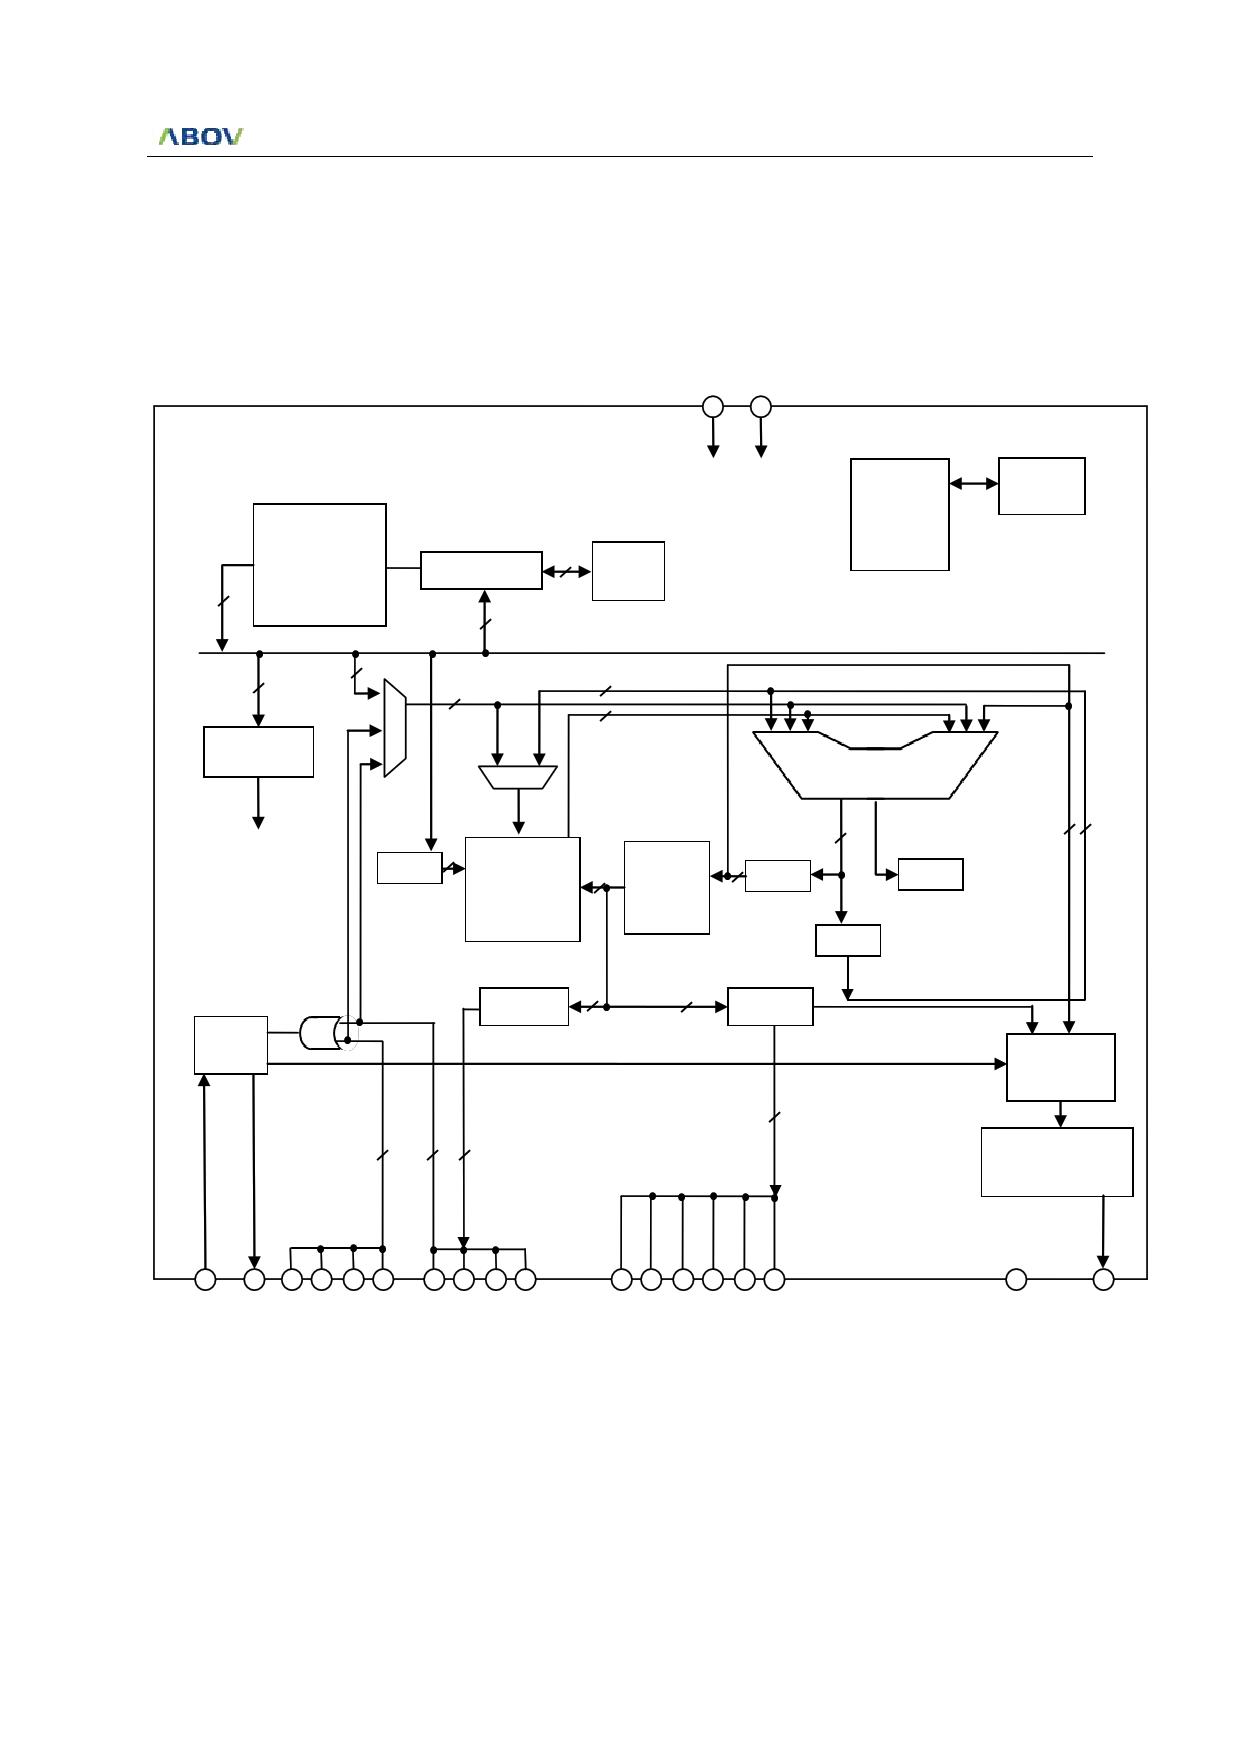 4 Bit 8 Instruction Alu Logic Diagram Of